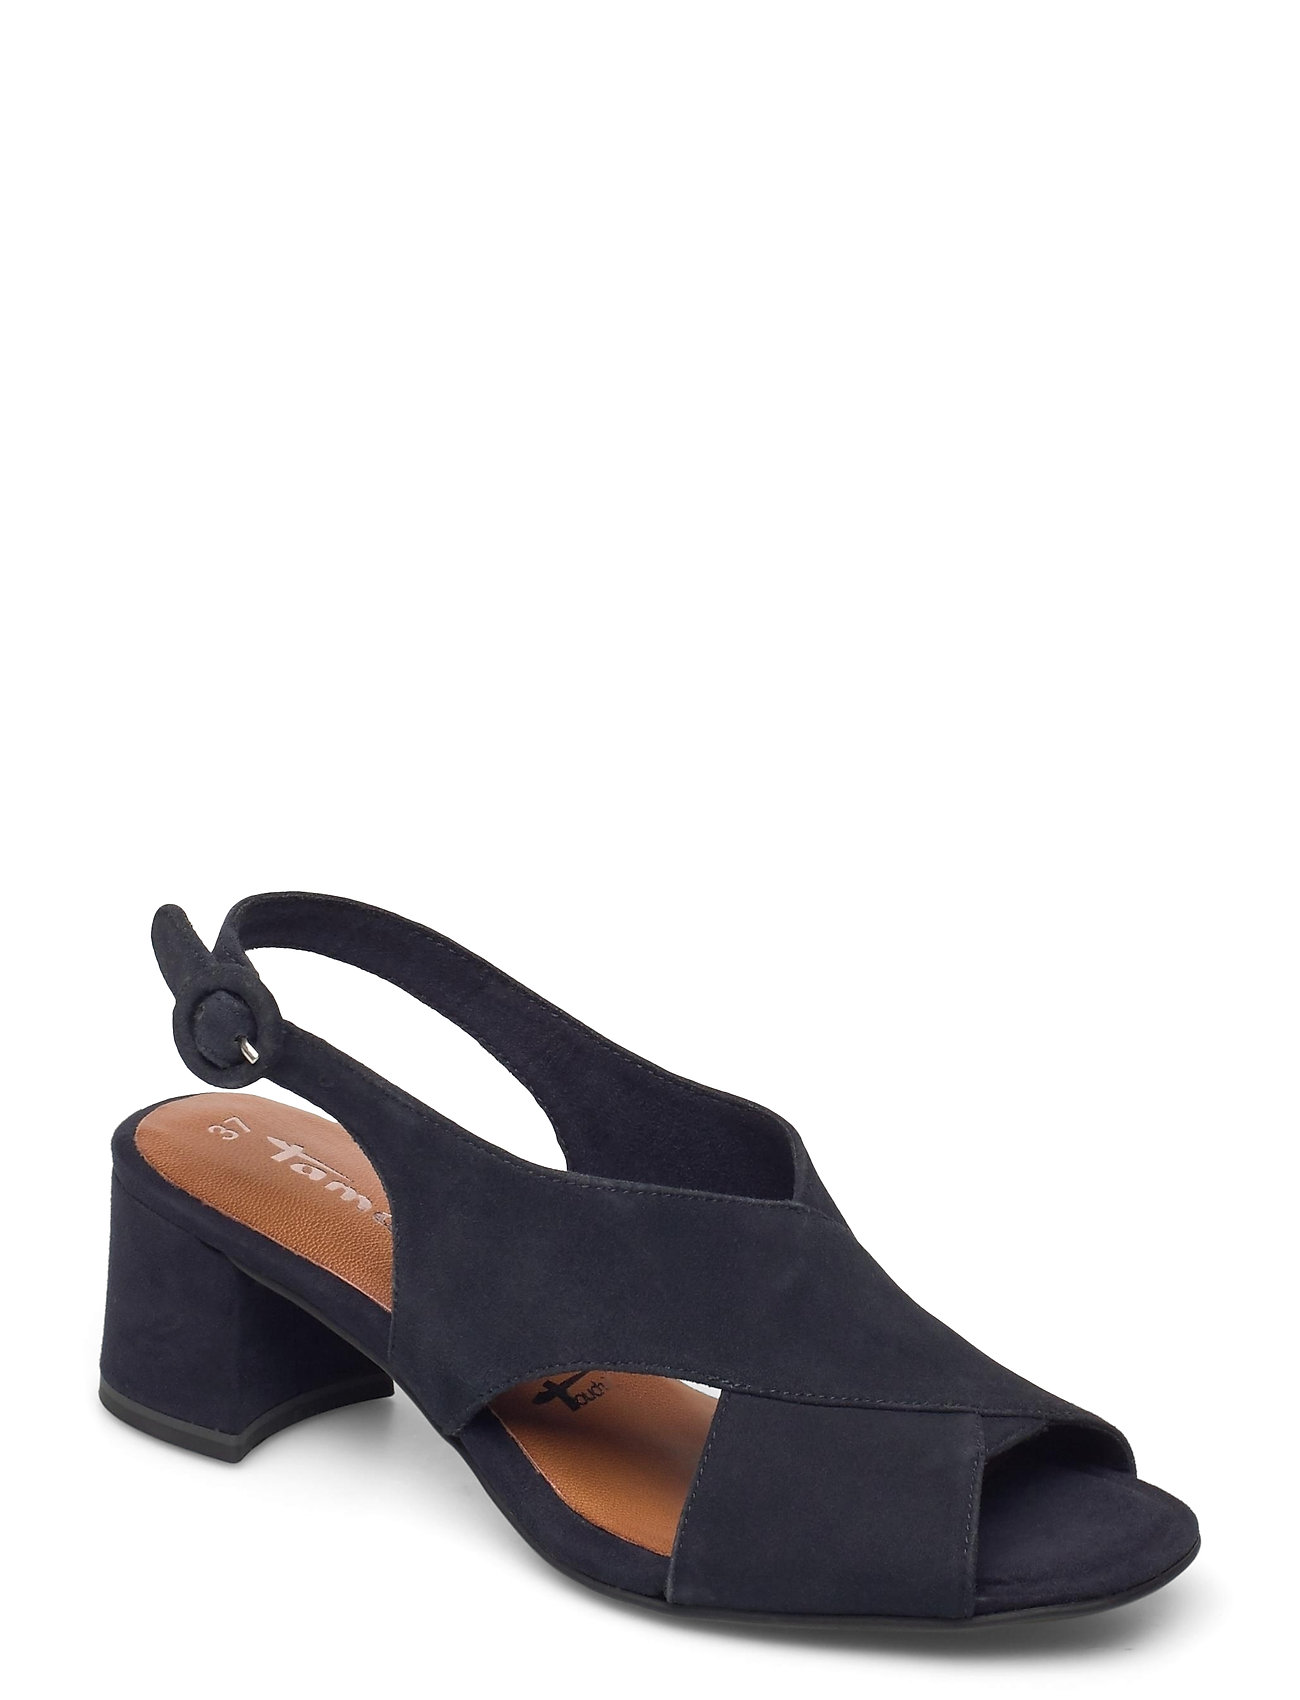 Woms Sandals Shoes Heels Pumps Sling Backs Blå Tamaris